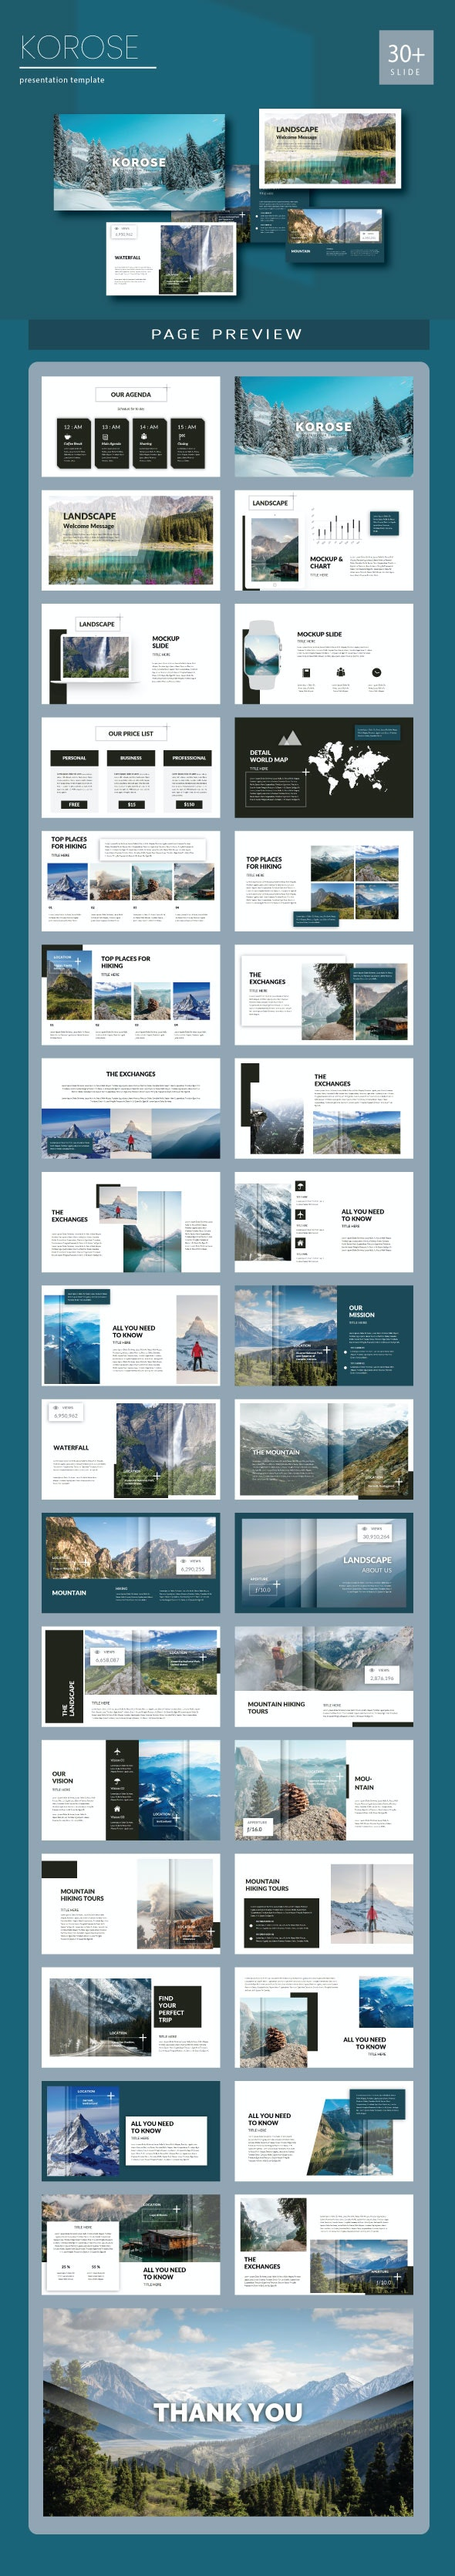 Korose Powerpoint Templates - Creative PowerPoint Templates